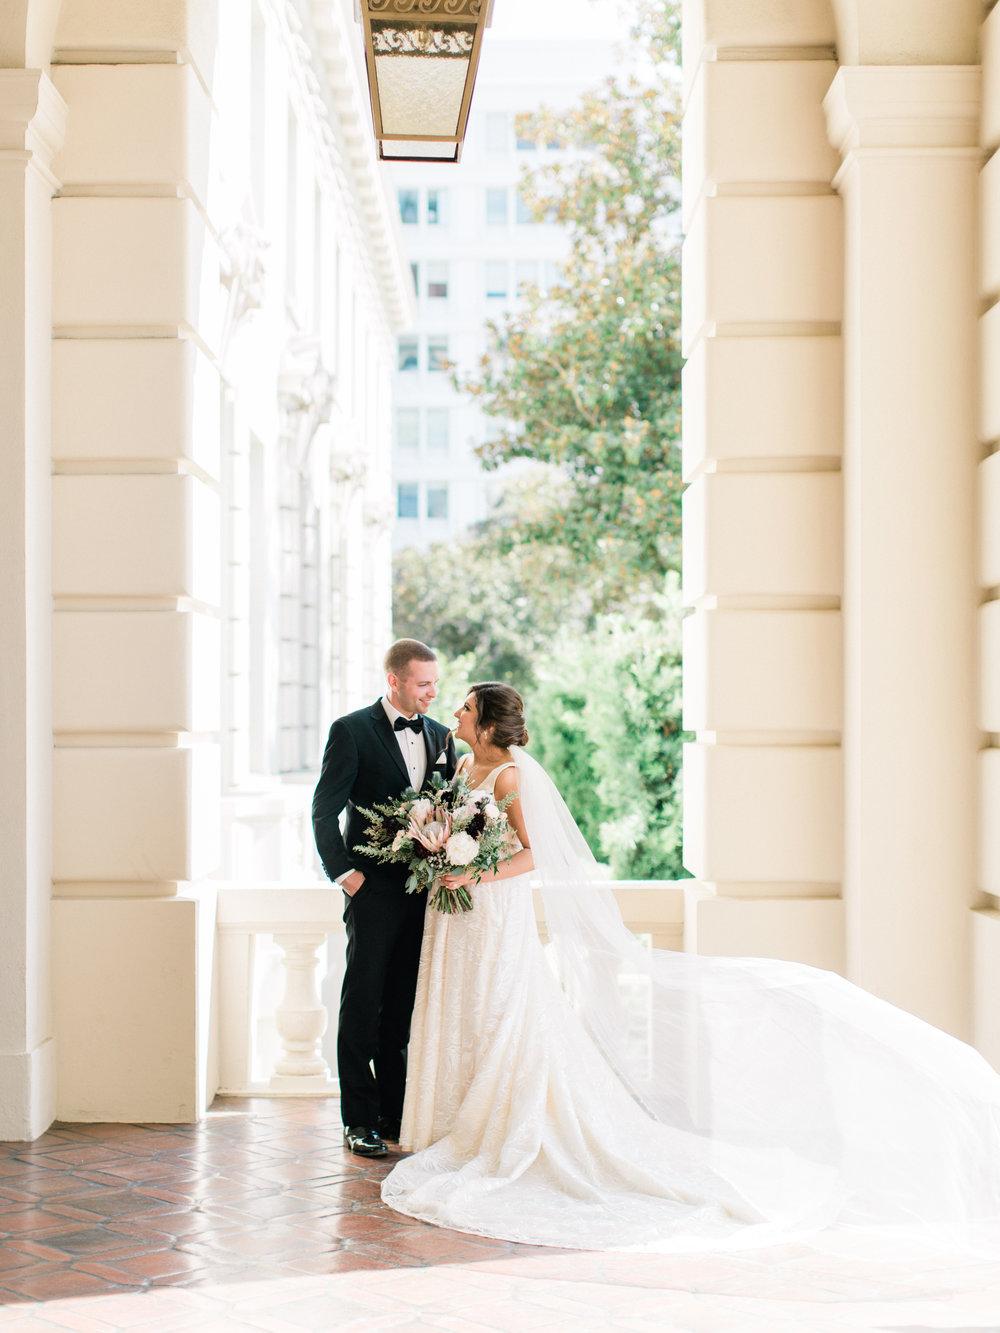 Ari-Jordan-Pasadena-City-Hall-Noor-Wedding-79.jpg